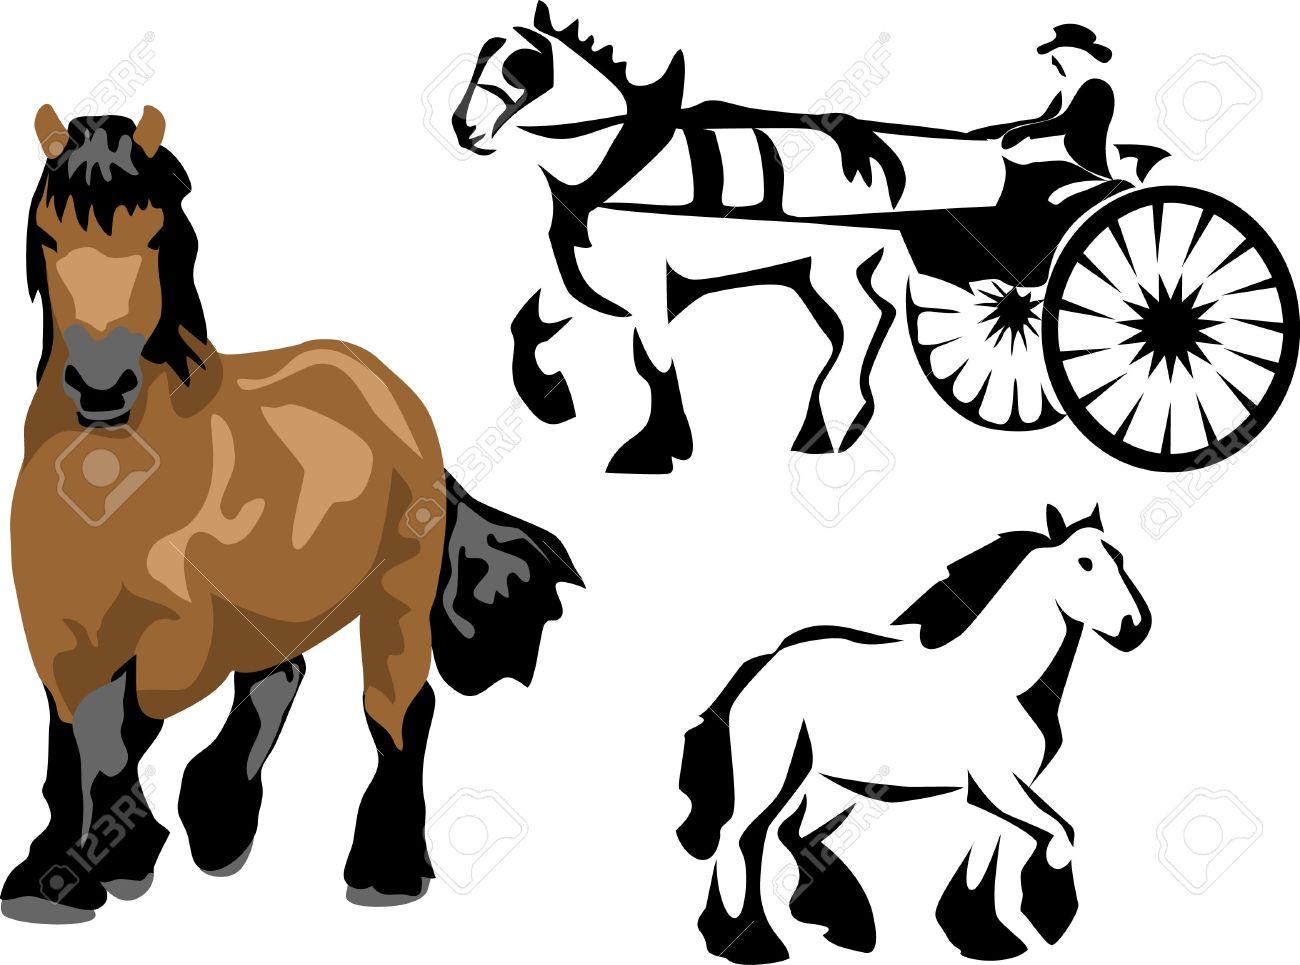 Draft Horse Clipart At GetDrawings.com